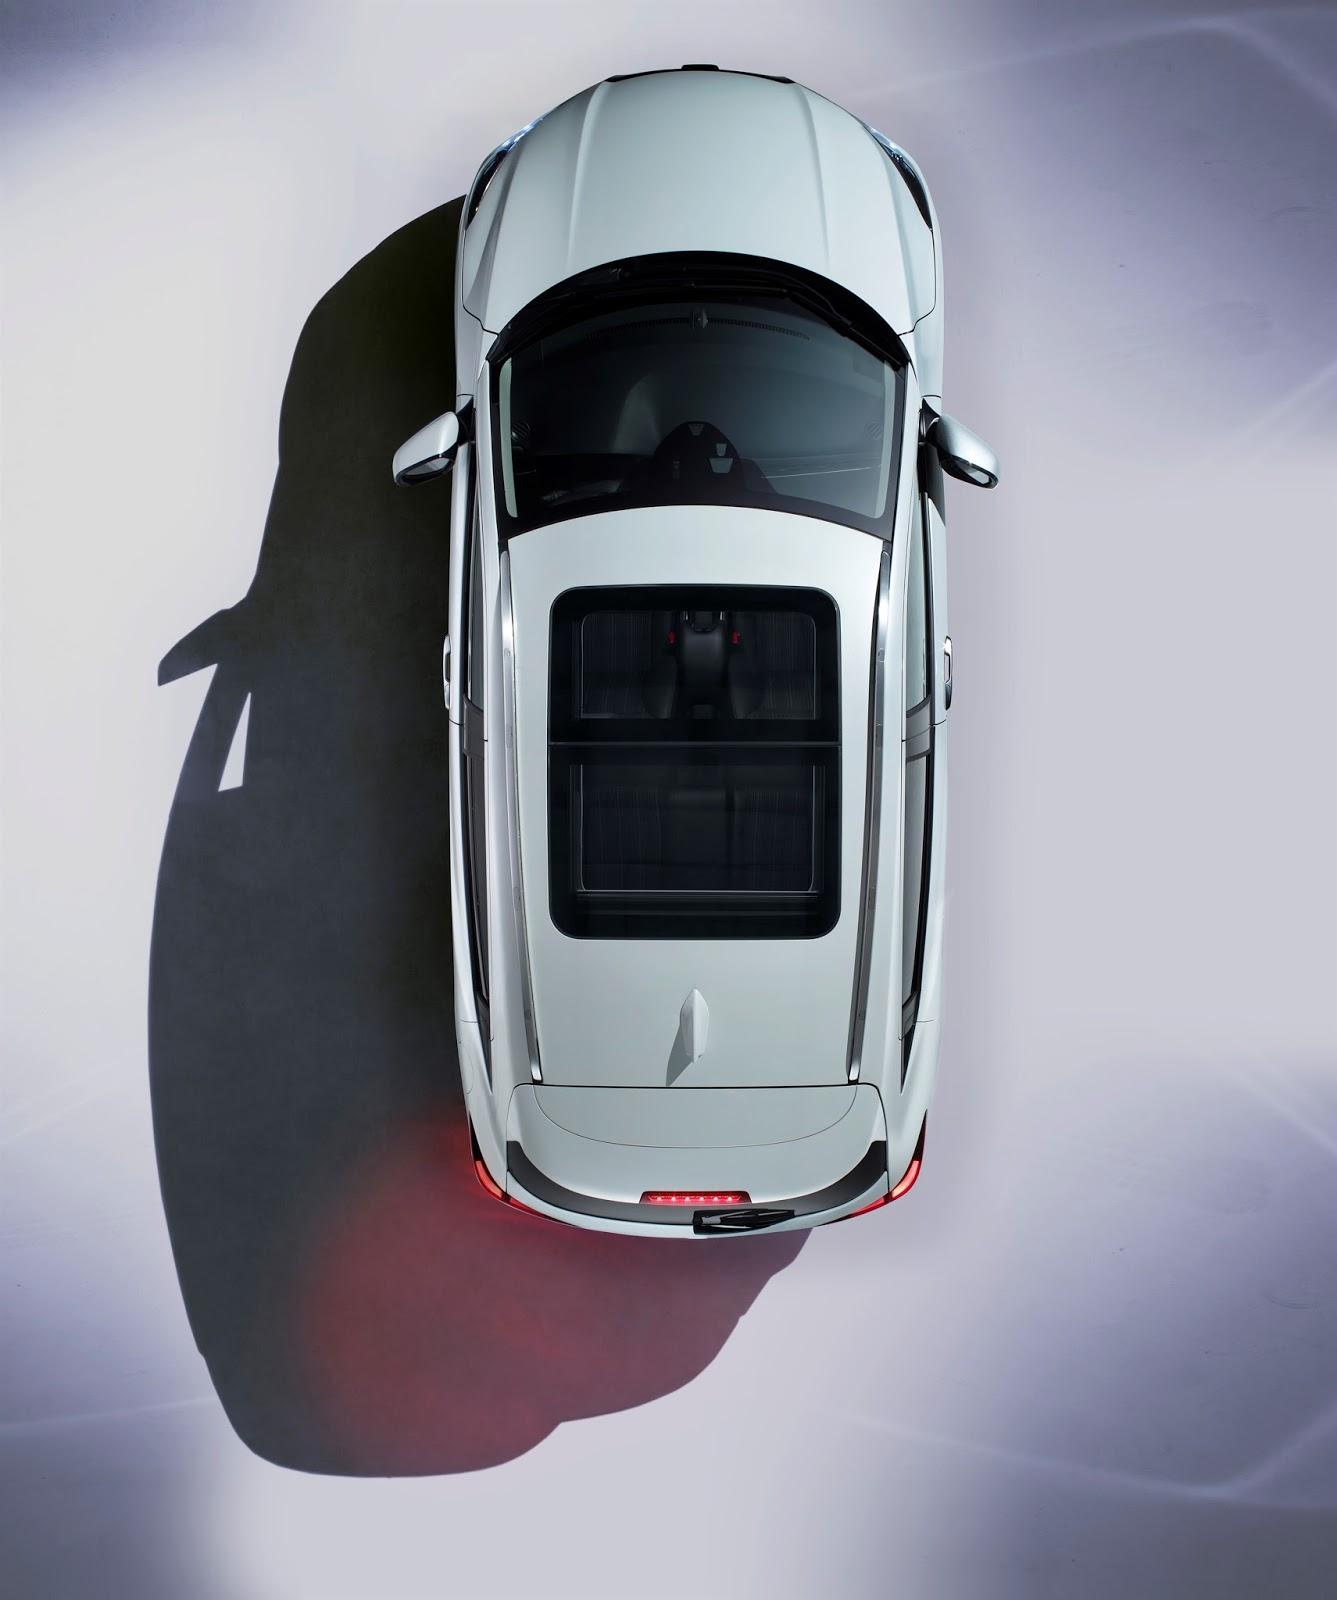 40679 2015 Honda HR V Νέο Honda HR-V : Το πολυμορφικό SUV